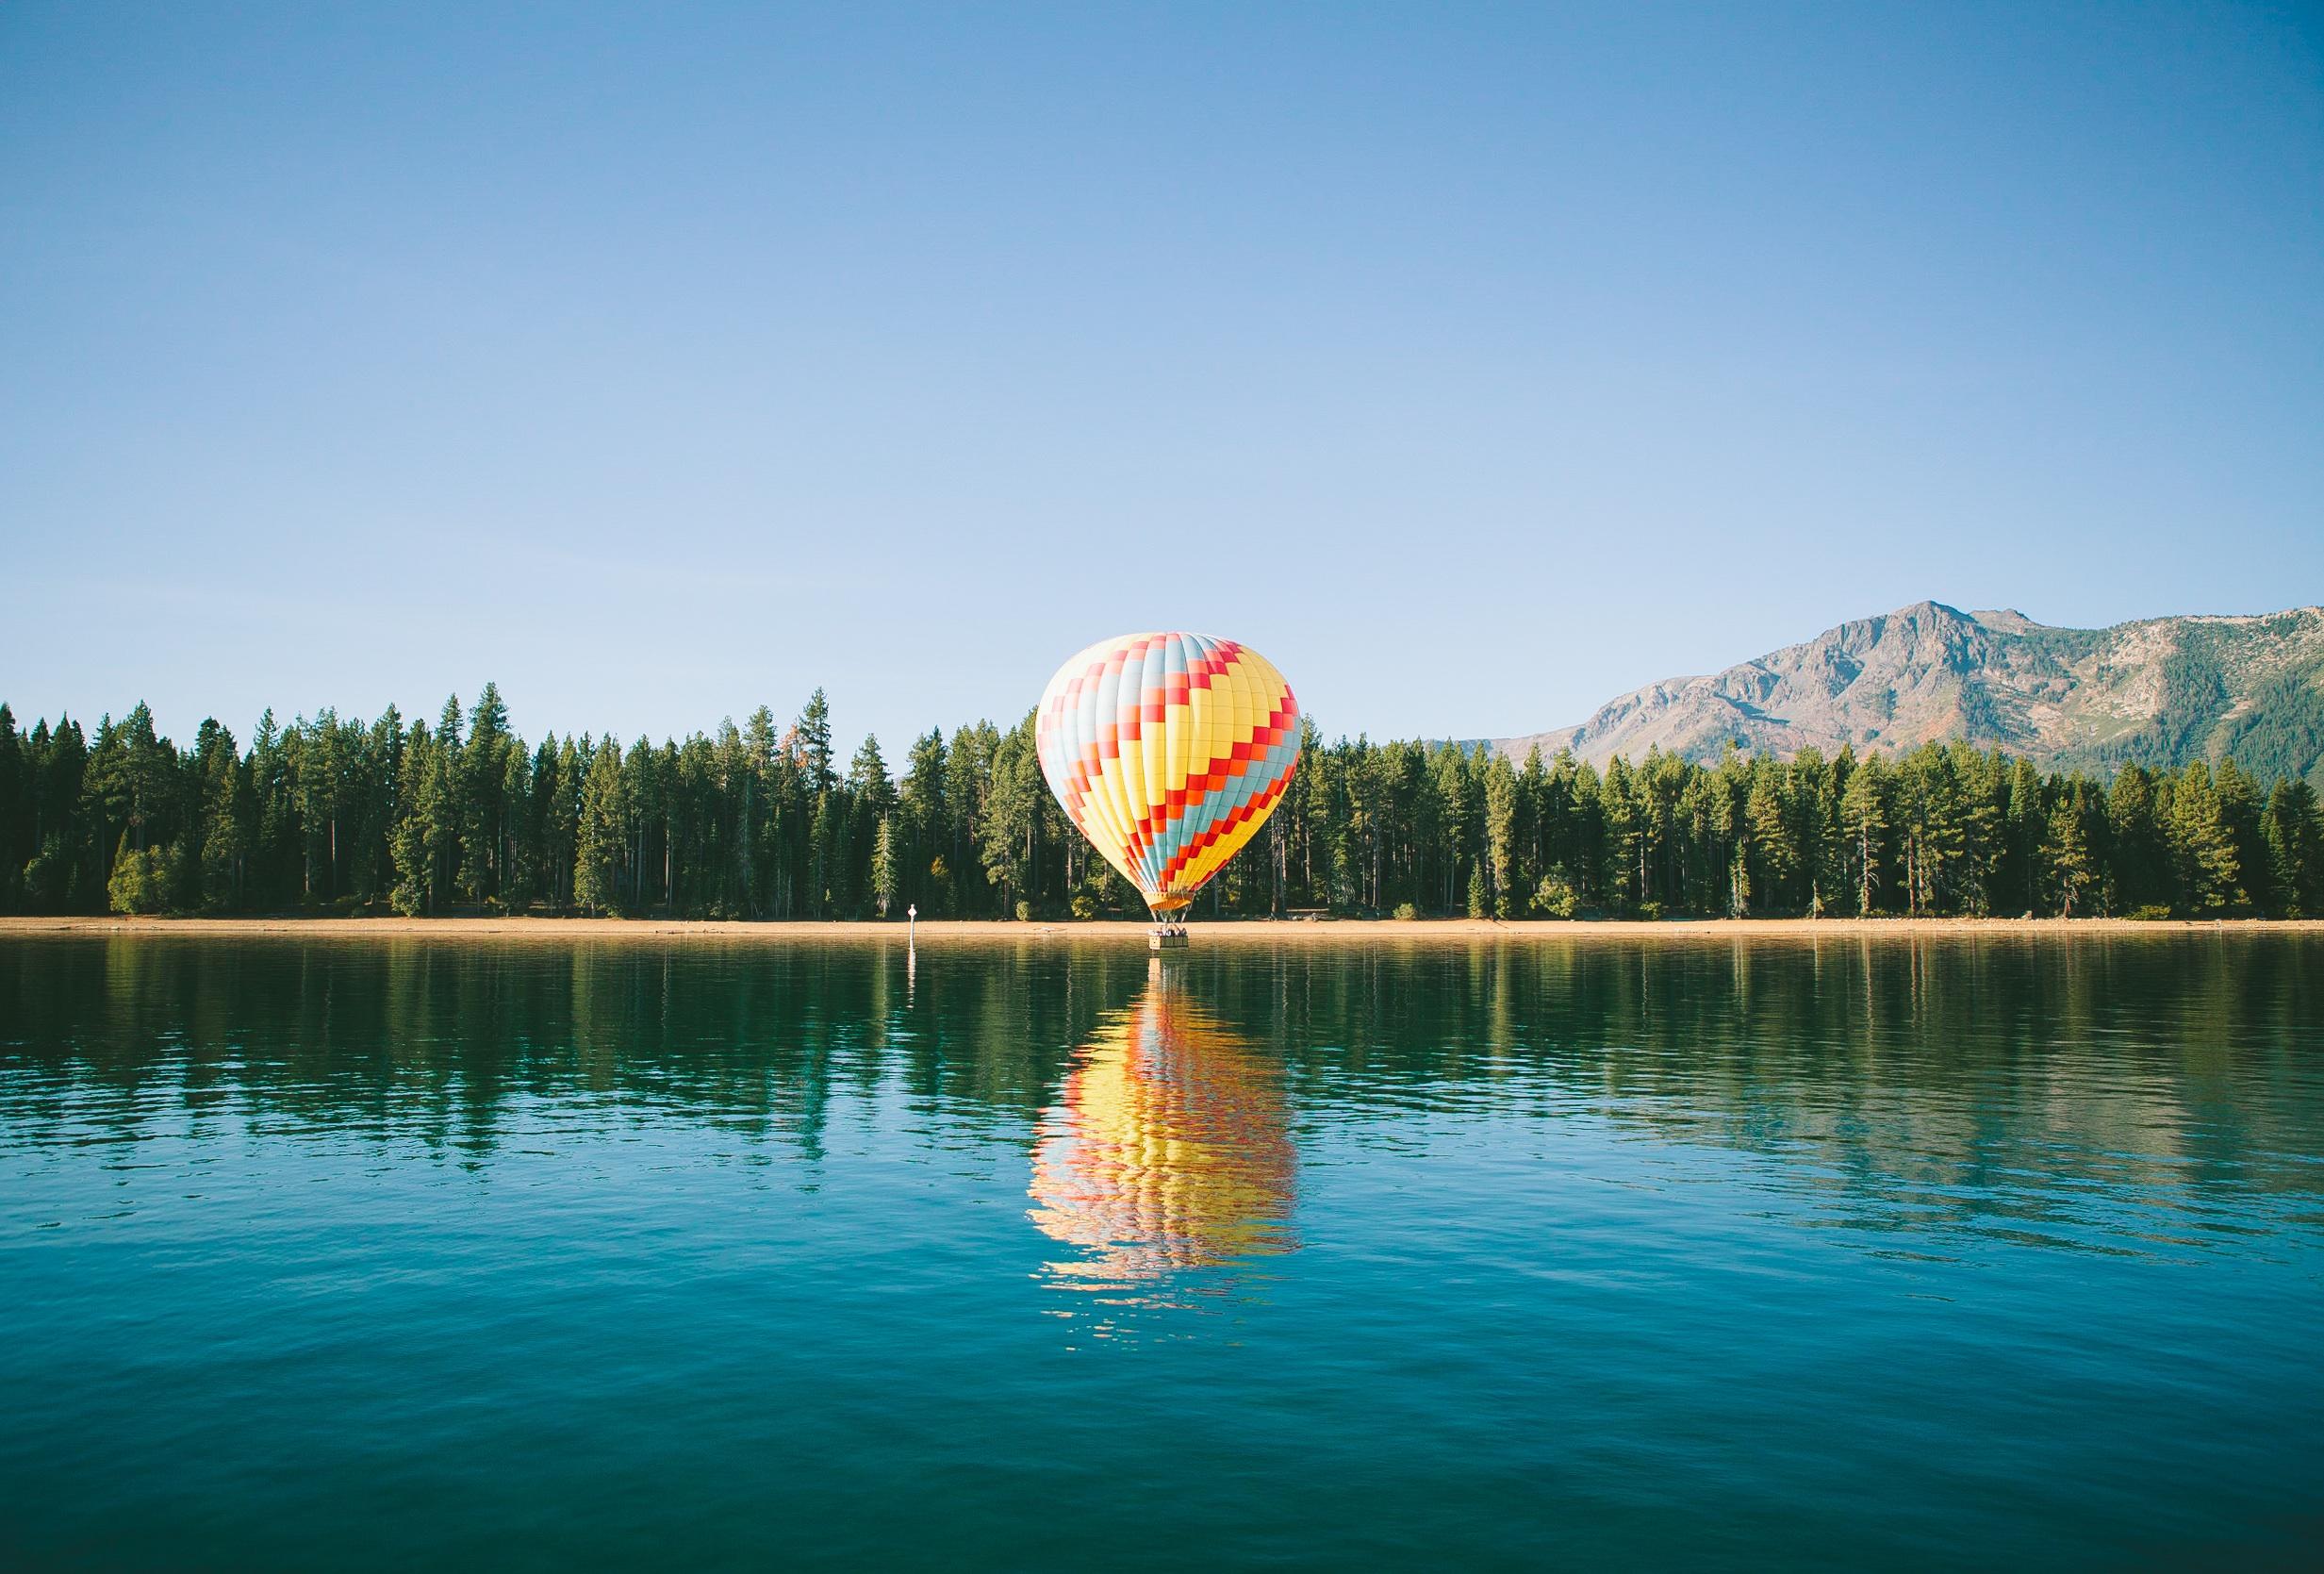 ballon à air, Lake, Forest, Pin, montagnes, Sky - Fonds d'écran HD - Professor-falken.com